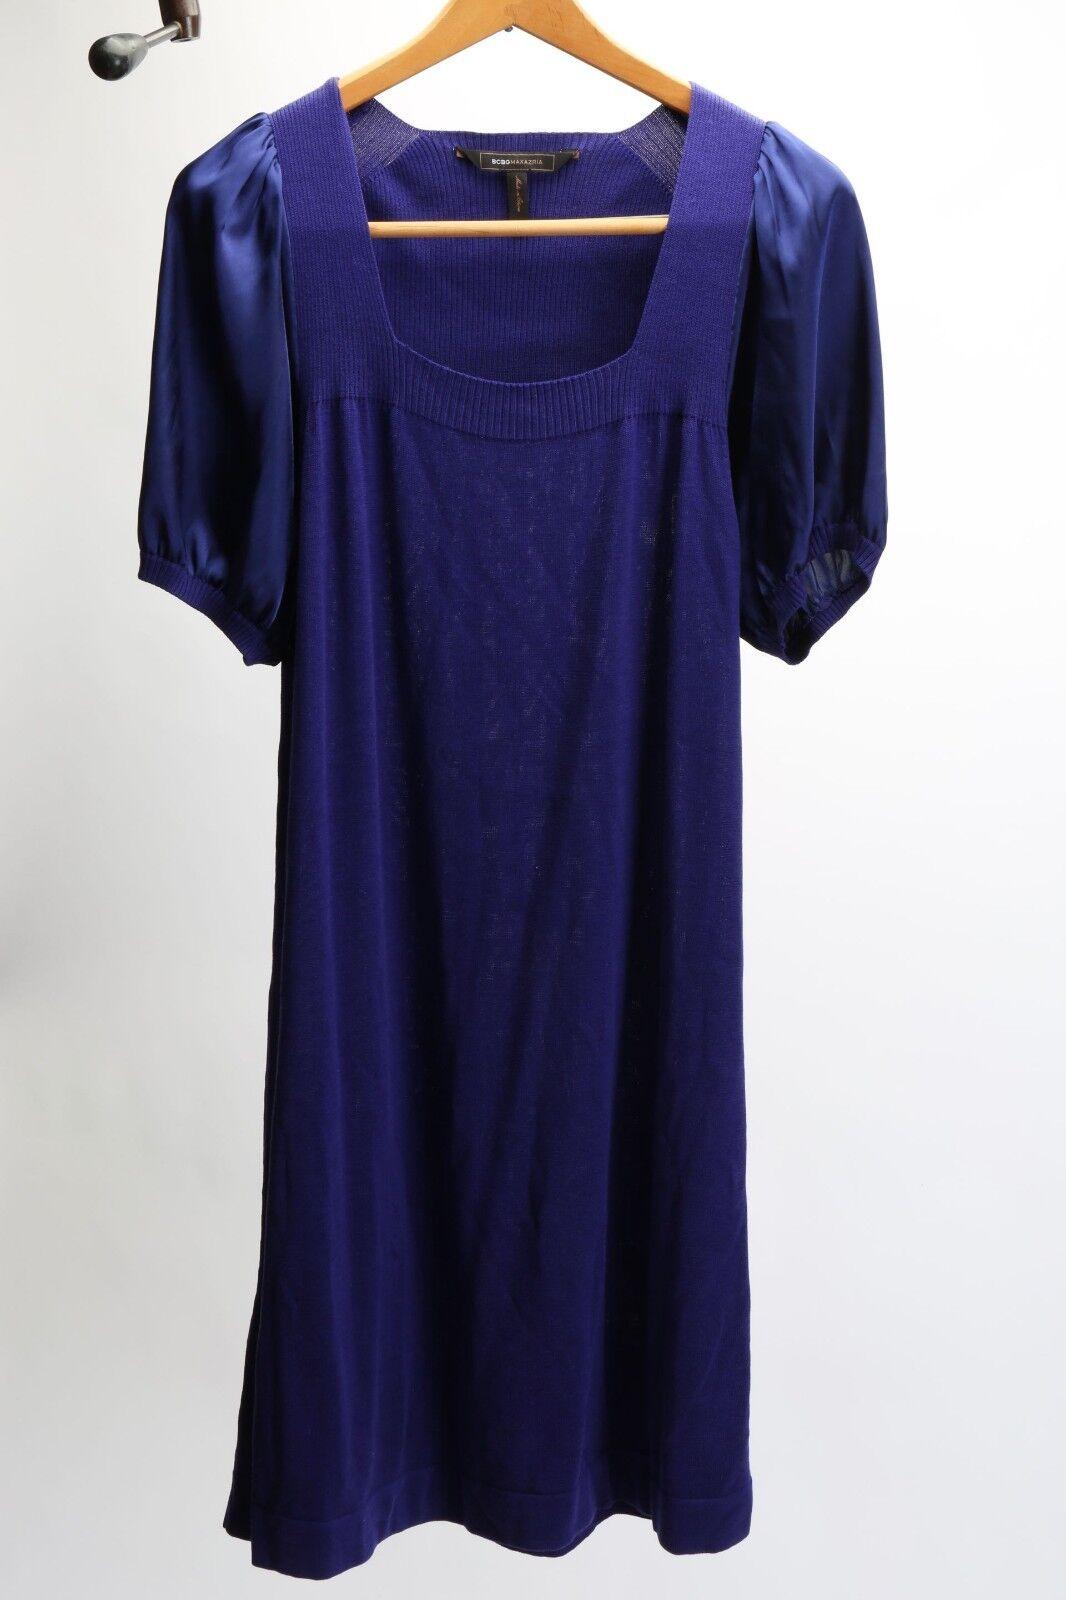 BCBG Max Azria - Royal Purple L Silk Cotton Short Sleeve Dress   totokaelo